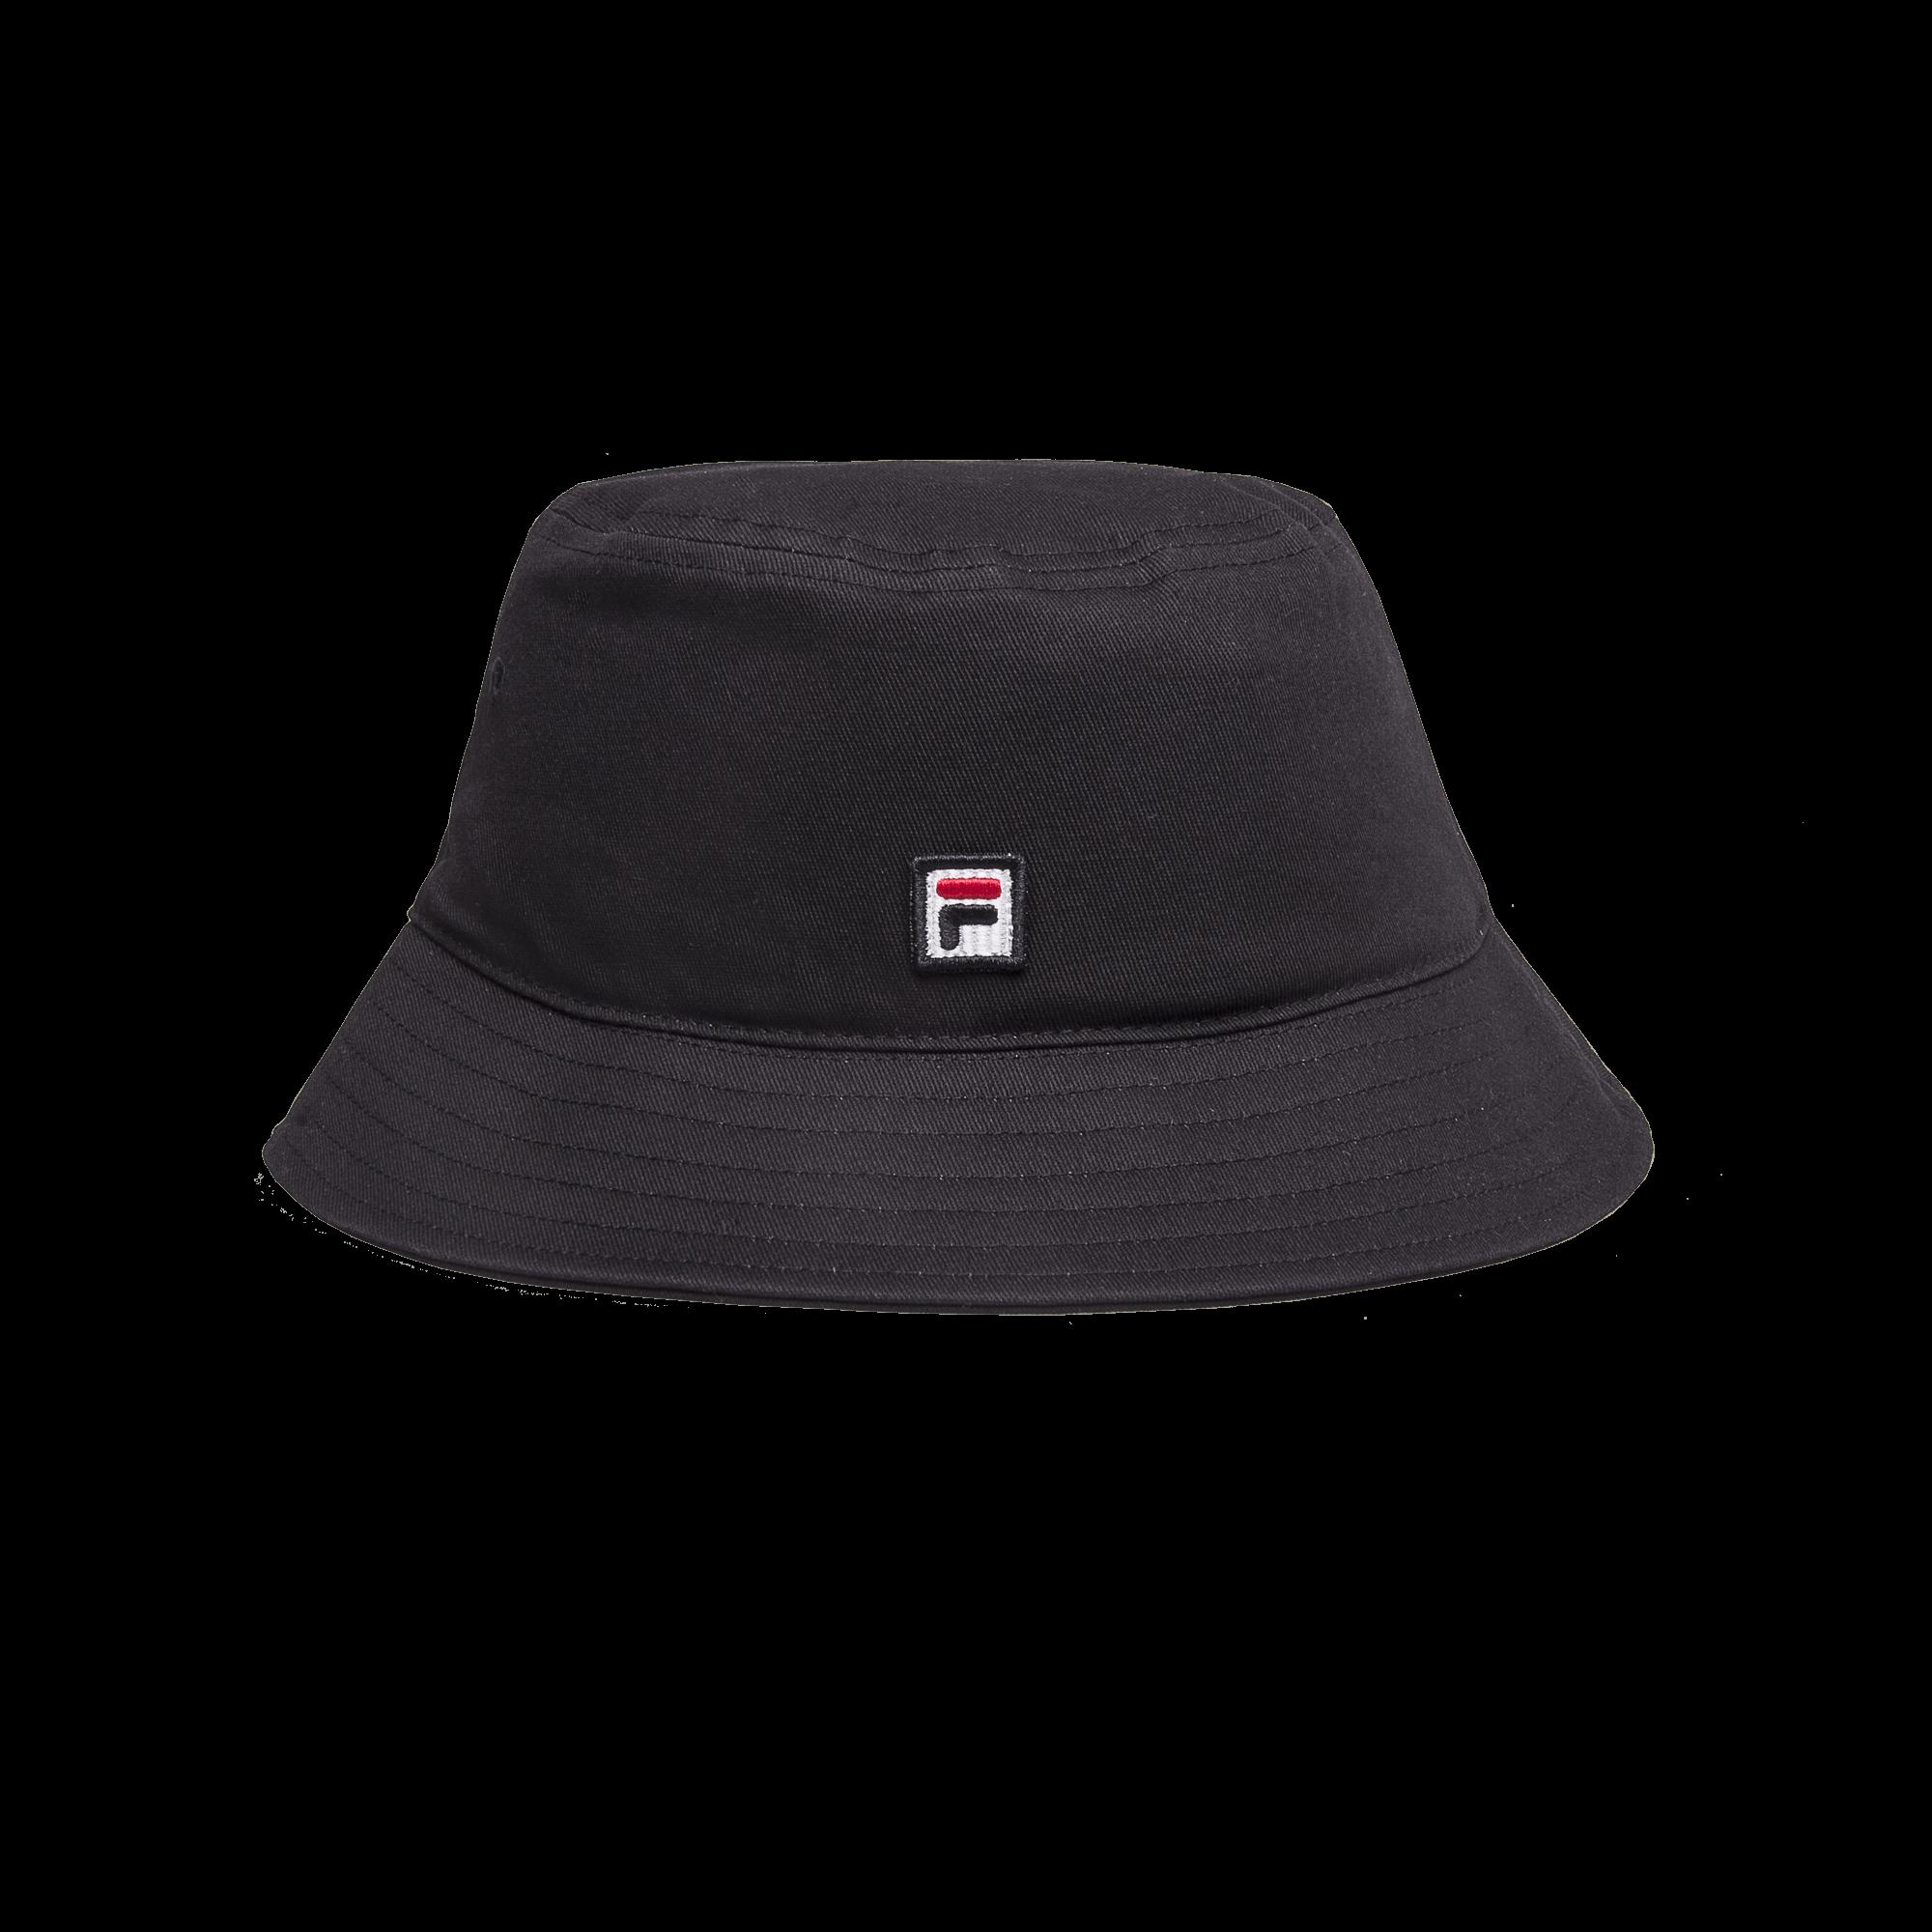 63b08a652c Fila Bucket Hat black - Cappelli